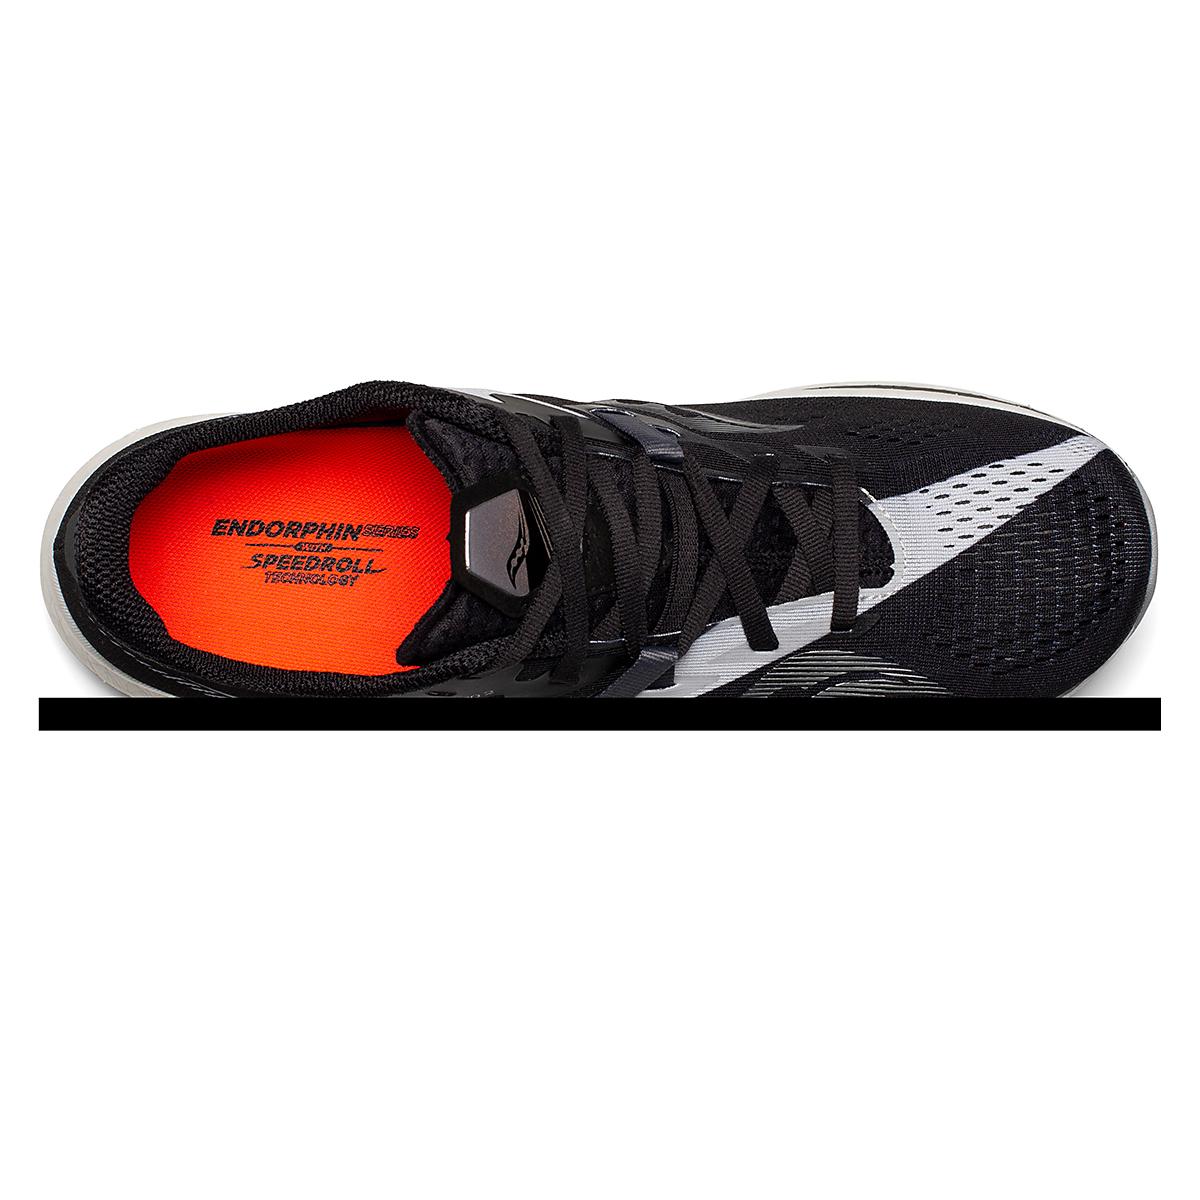 Men's Saucony Endorphin Pro 2 Running Shoe - Color: Black/White - Size: 7 - Width: Regular, Black/White, large, image 3